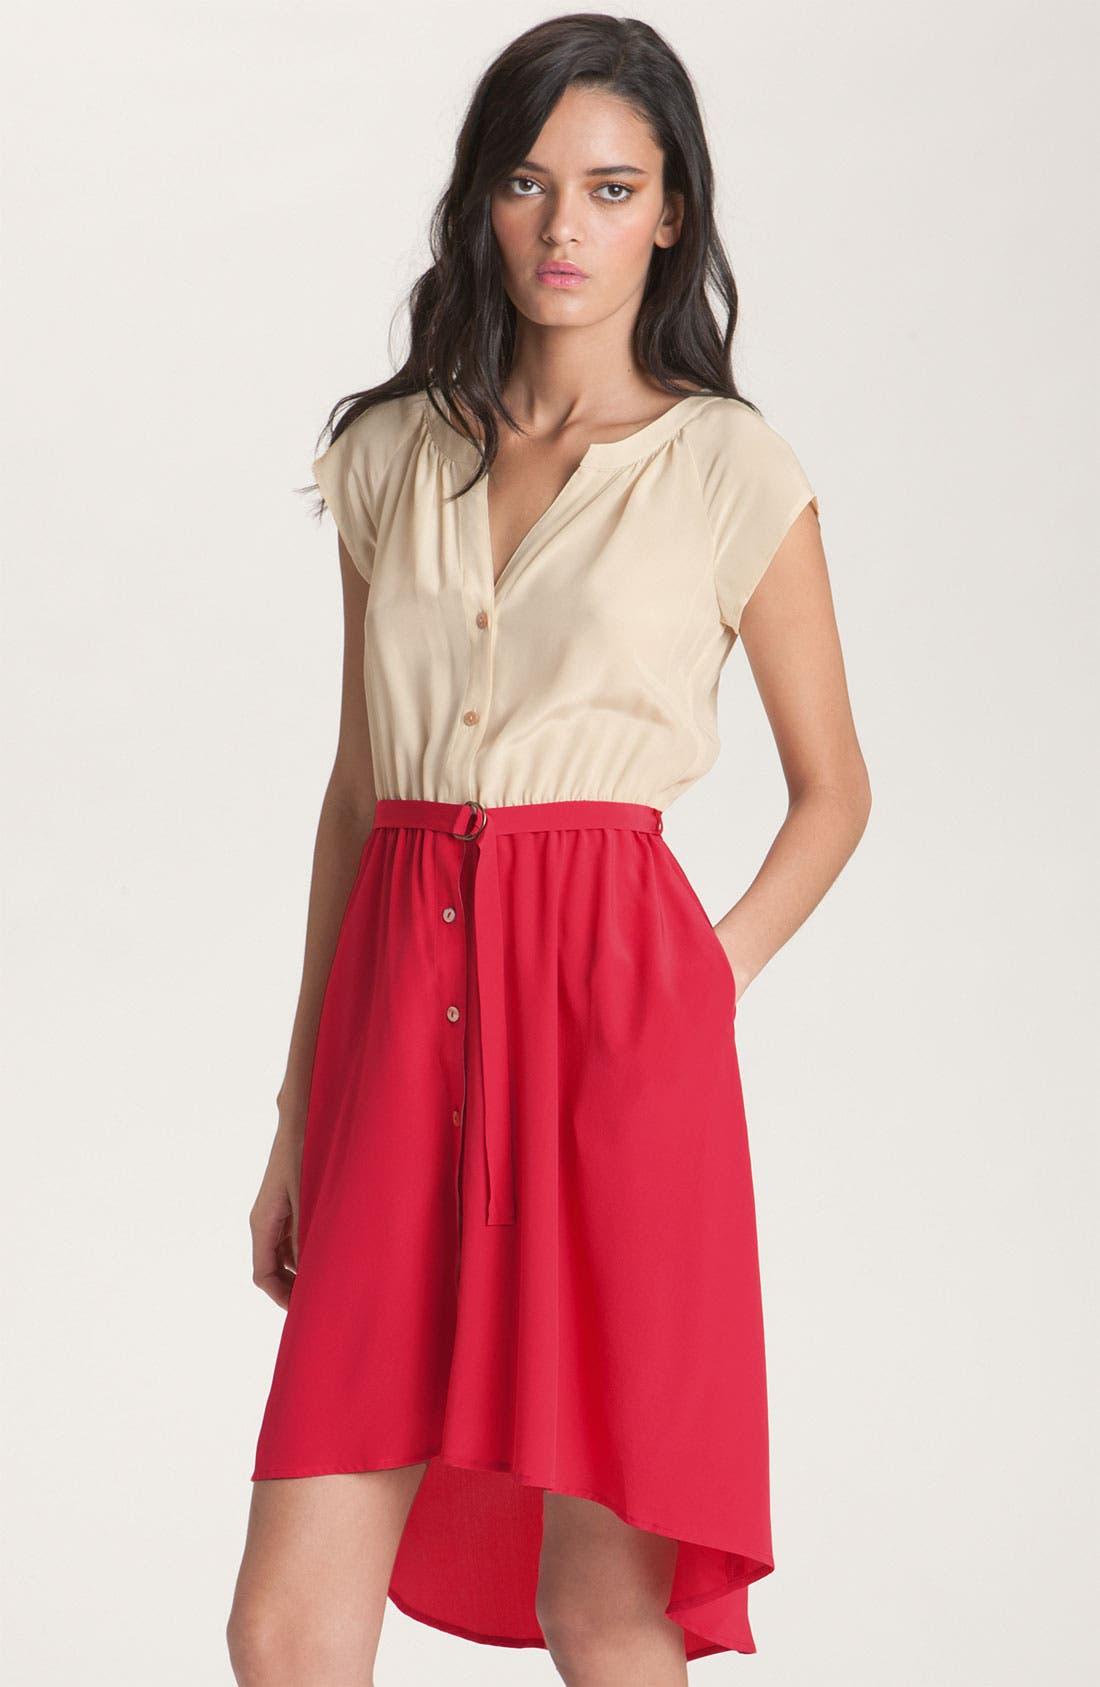 Main Image - Presley Skye Belted Colorblock Silk Dress